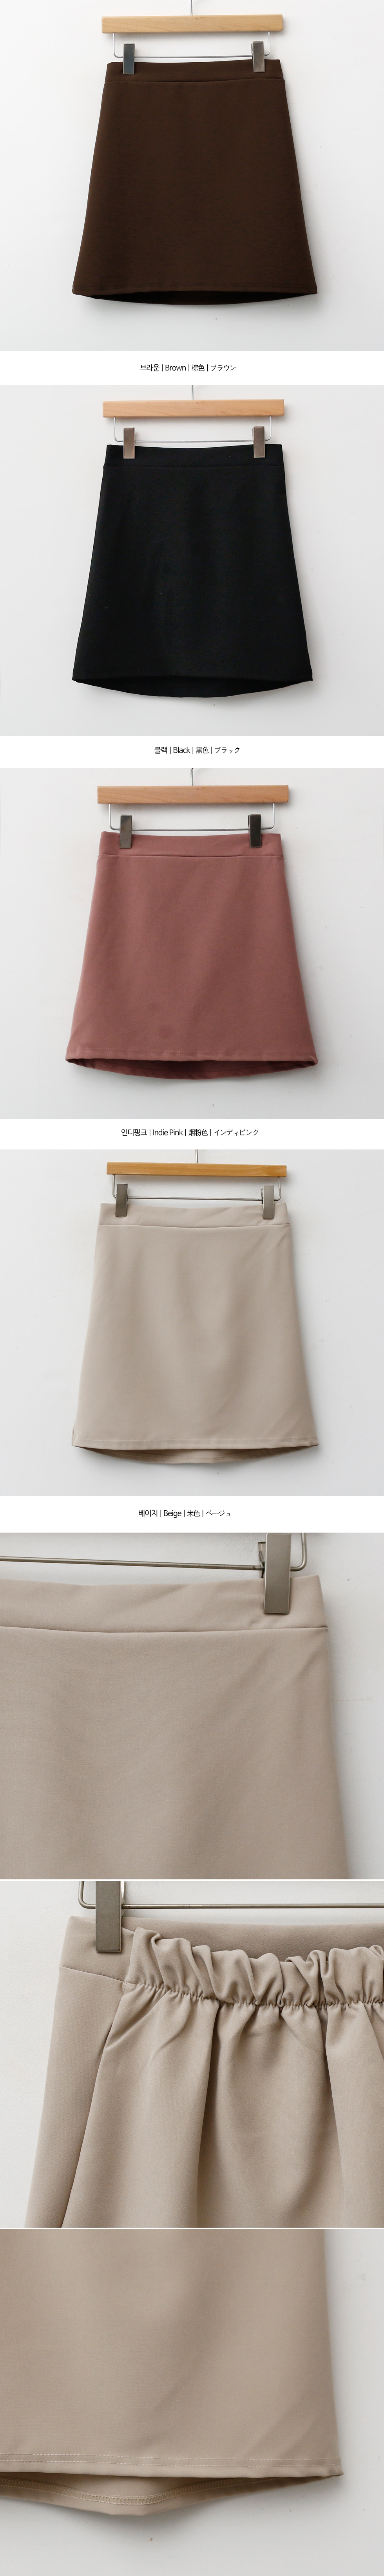 French mini skirt